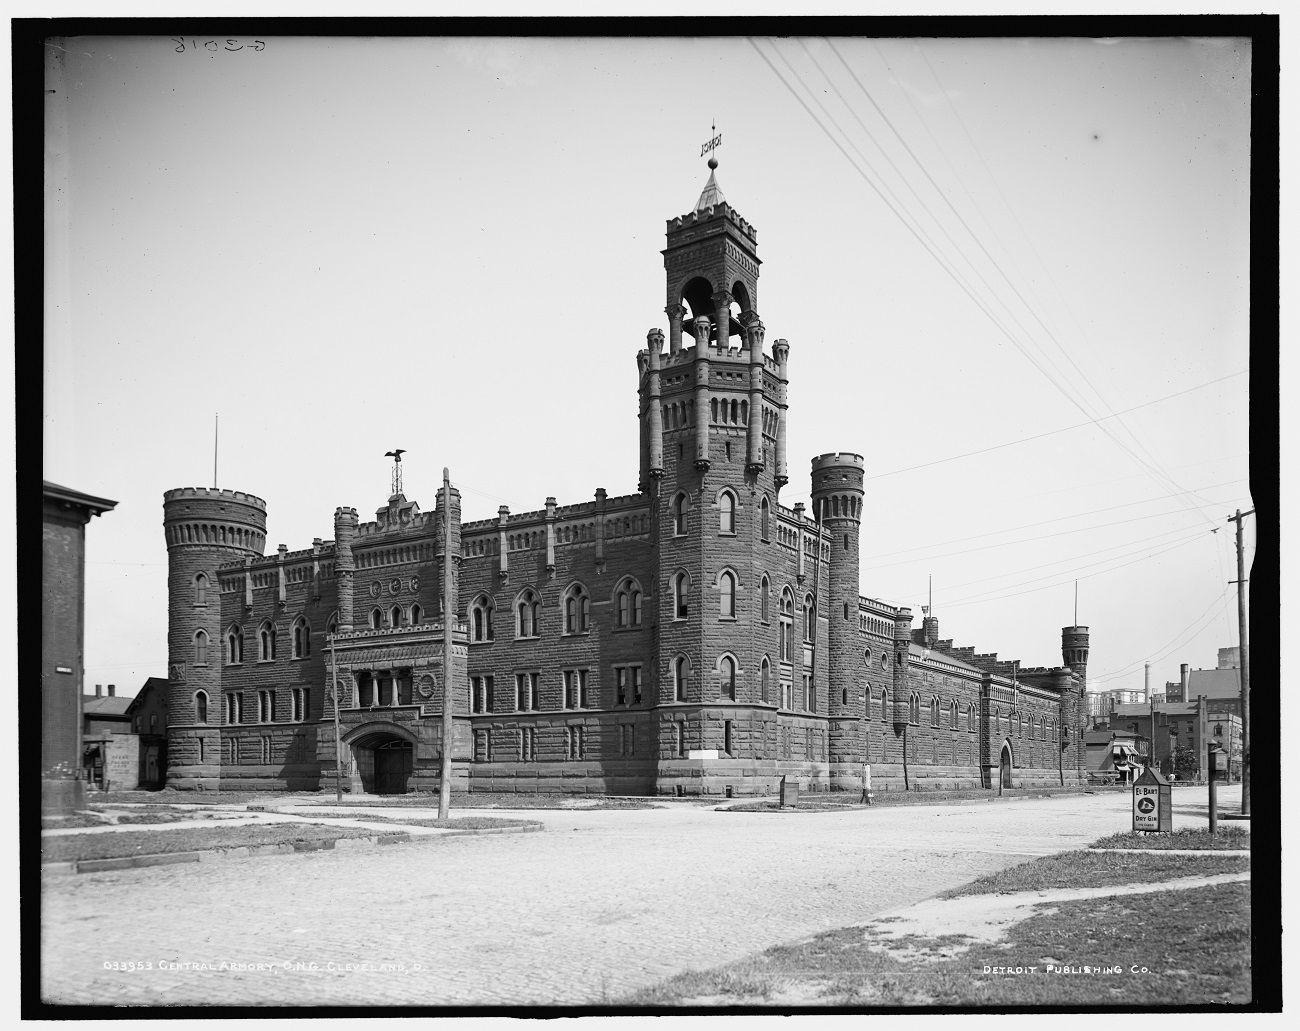 Central armory, O.N.G. [Ohio National Guard], Cleveland, Ohio  1900